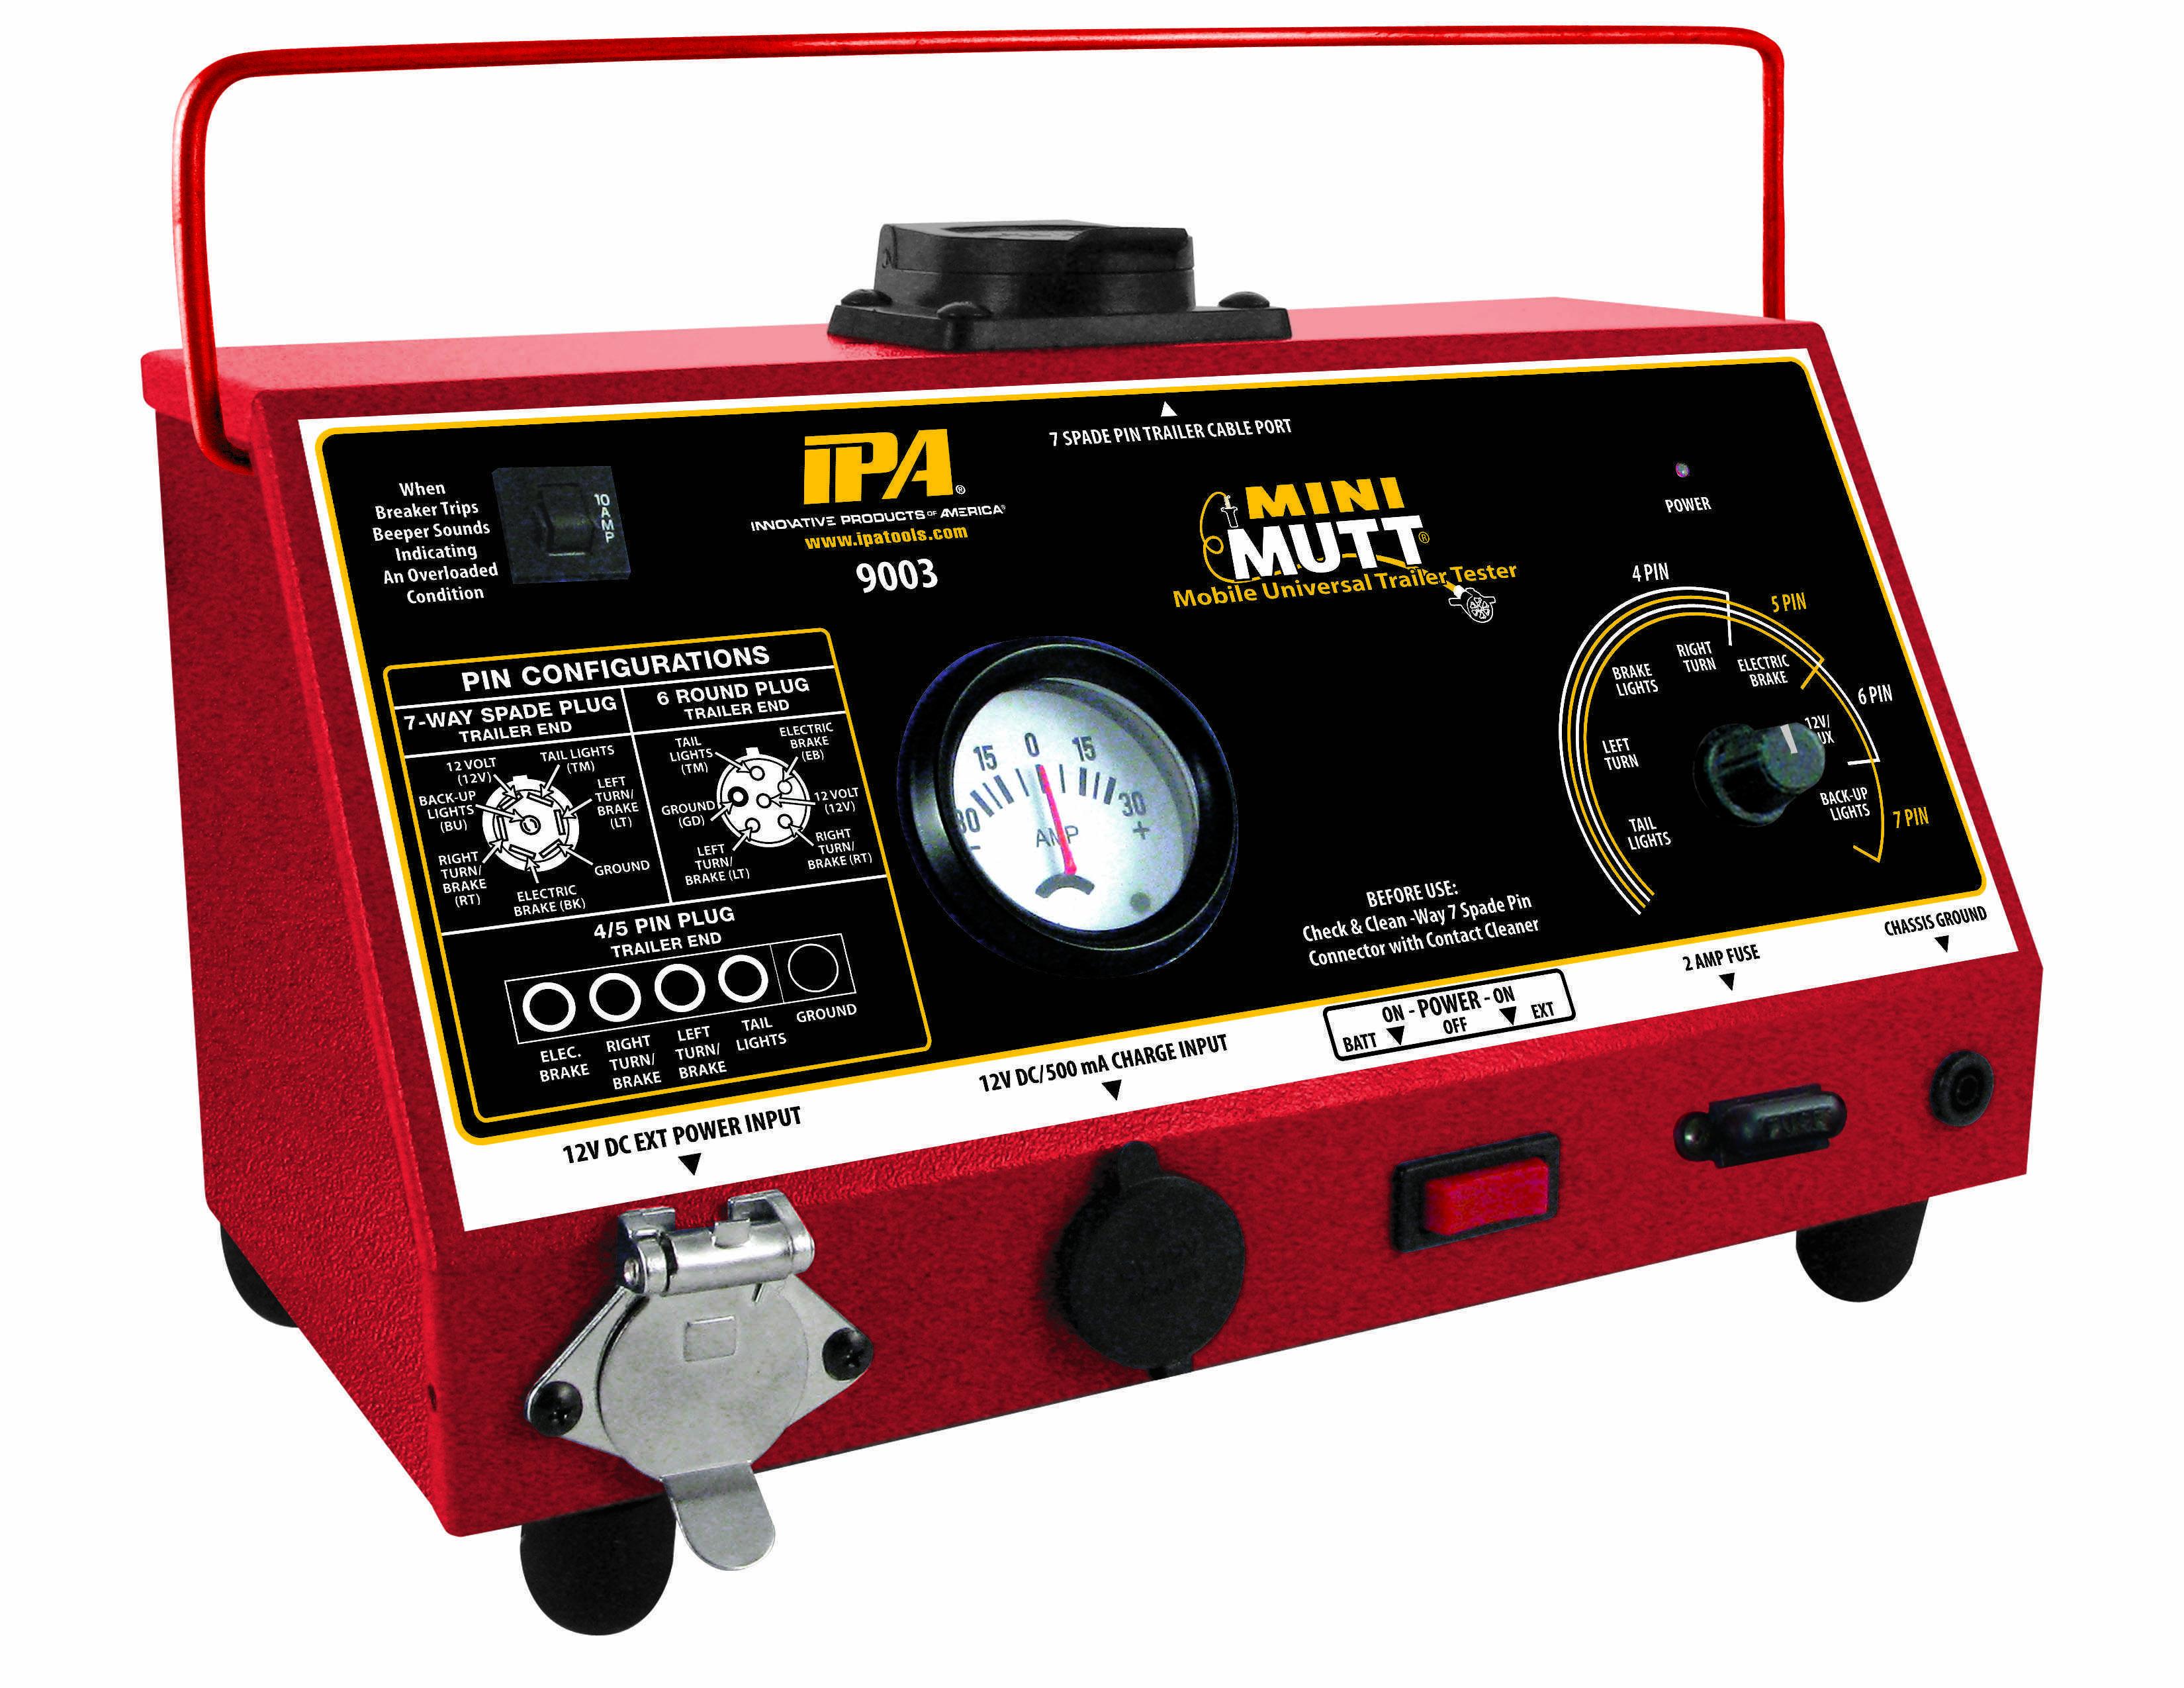 IPA debuts Mini-Mutt line of portable trailer testers